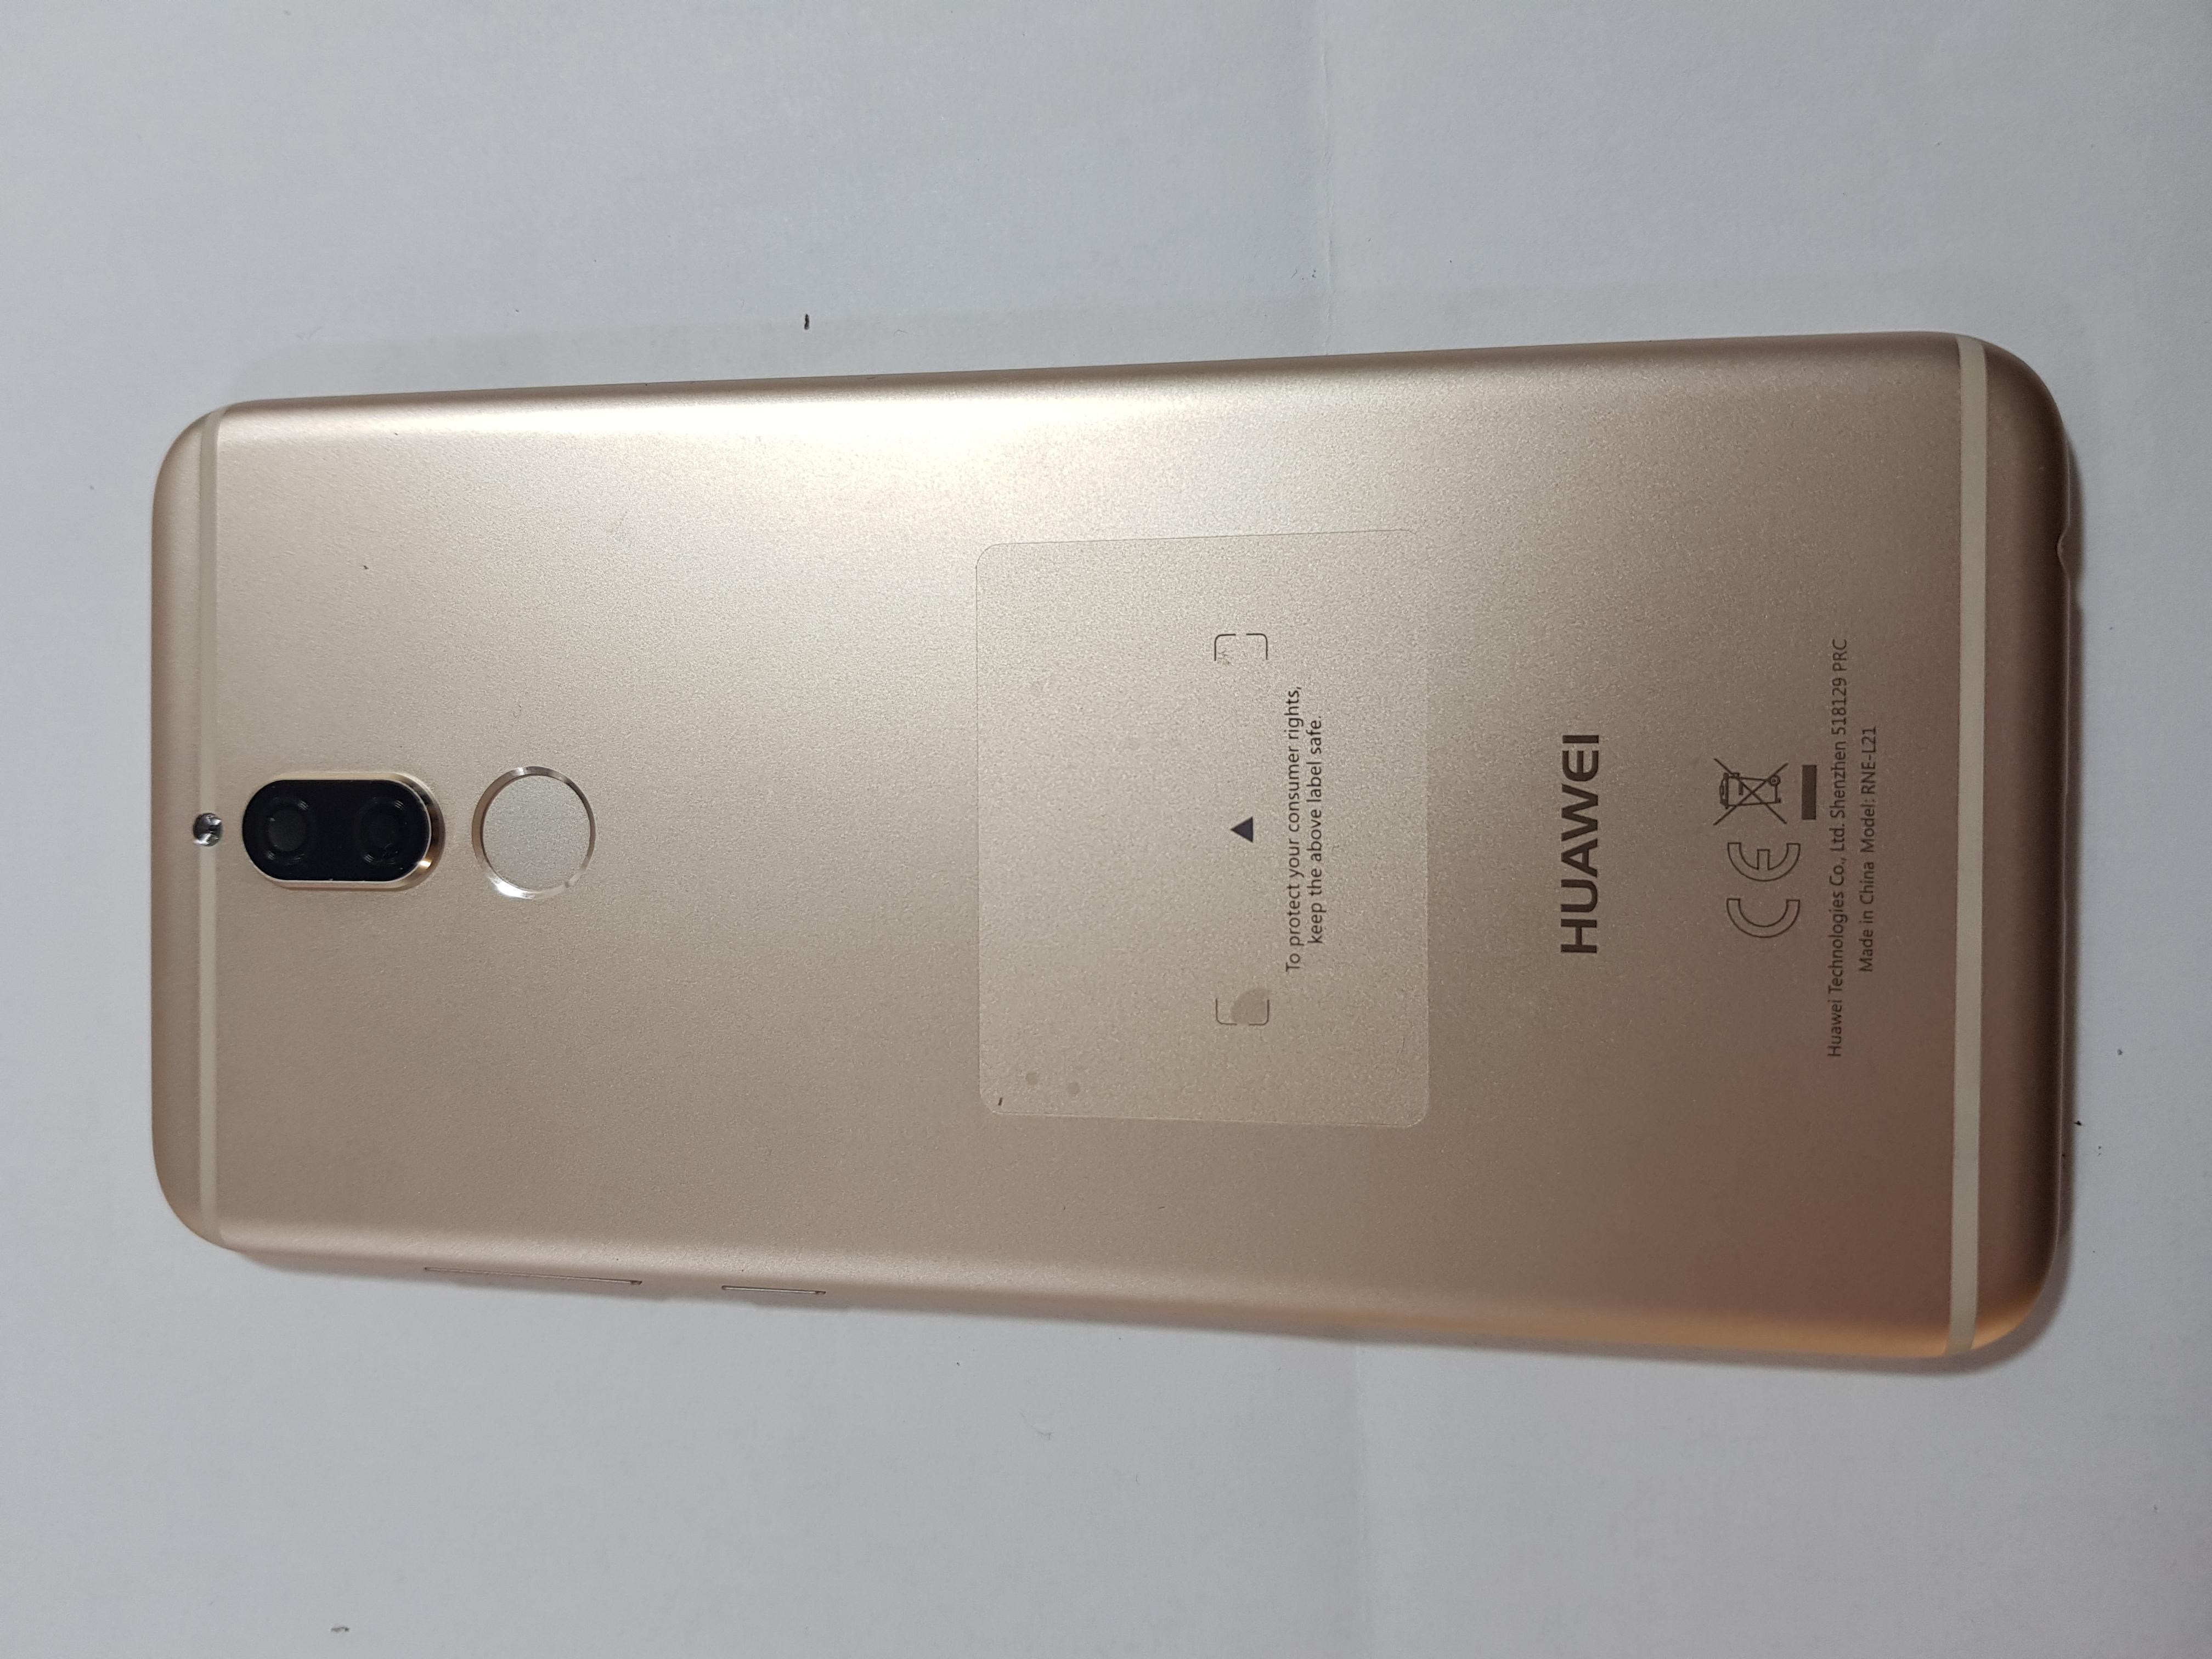 Carcara rama mijloc Huawei Mate 10 Lite 0